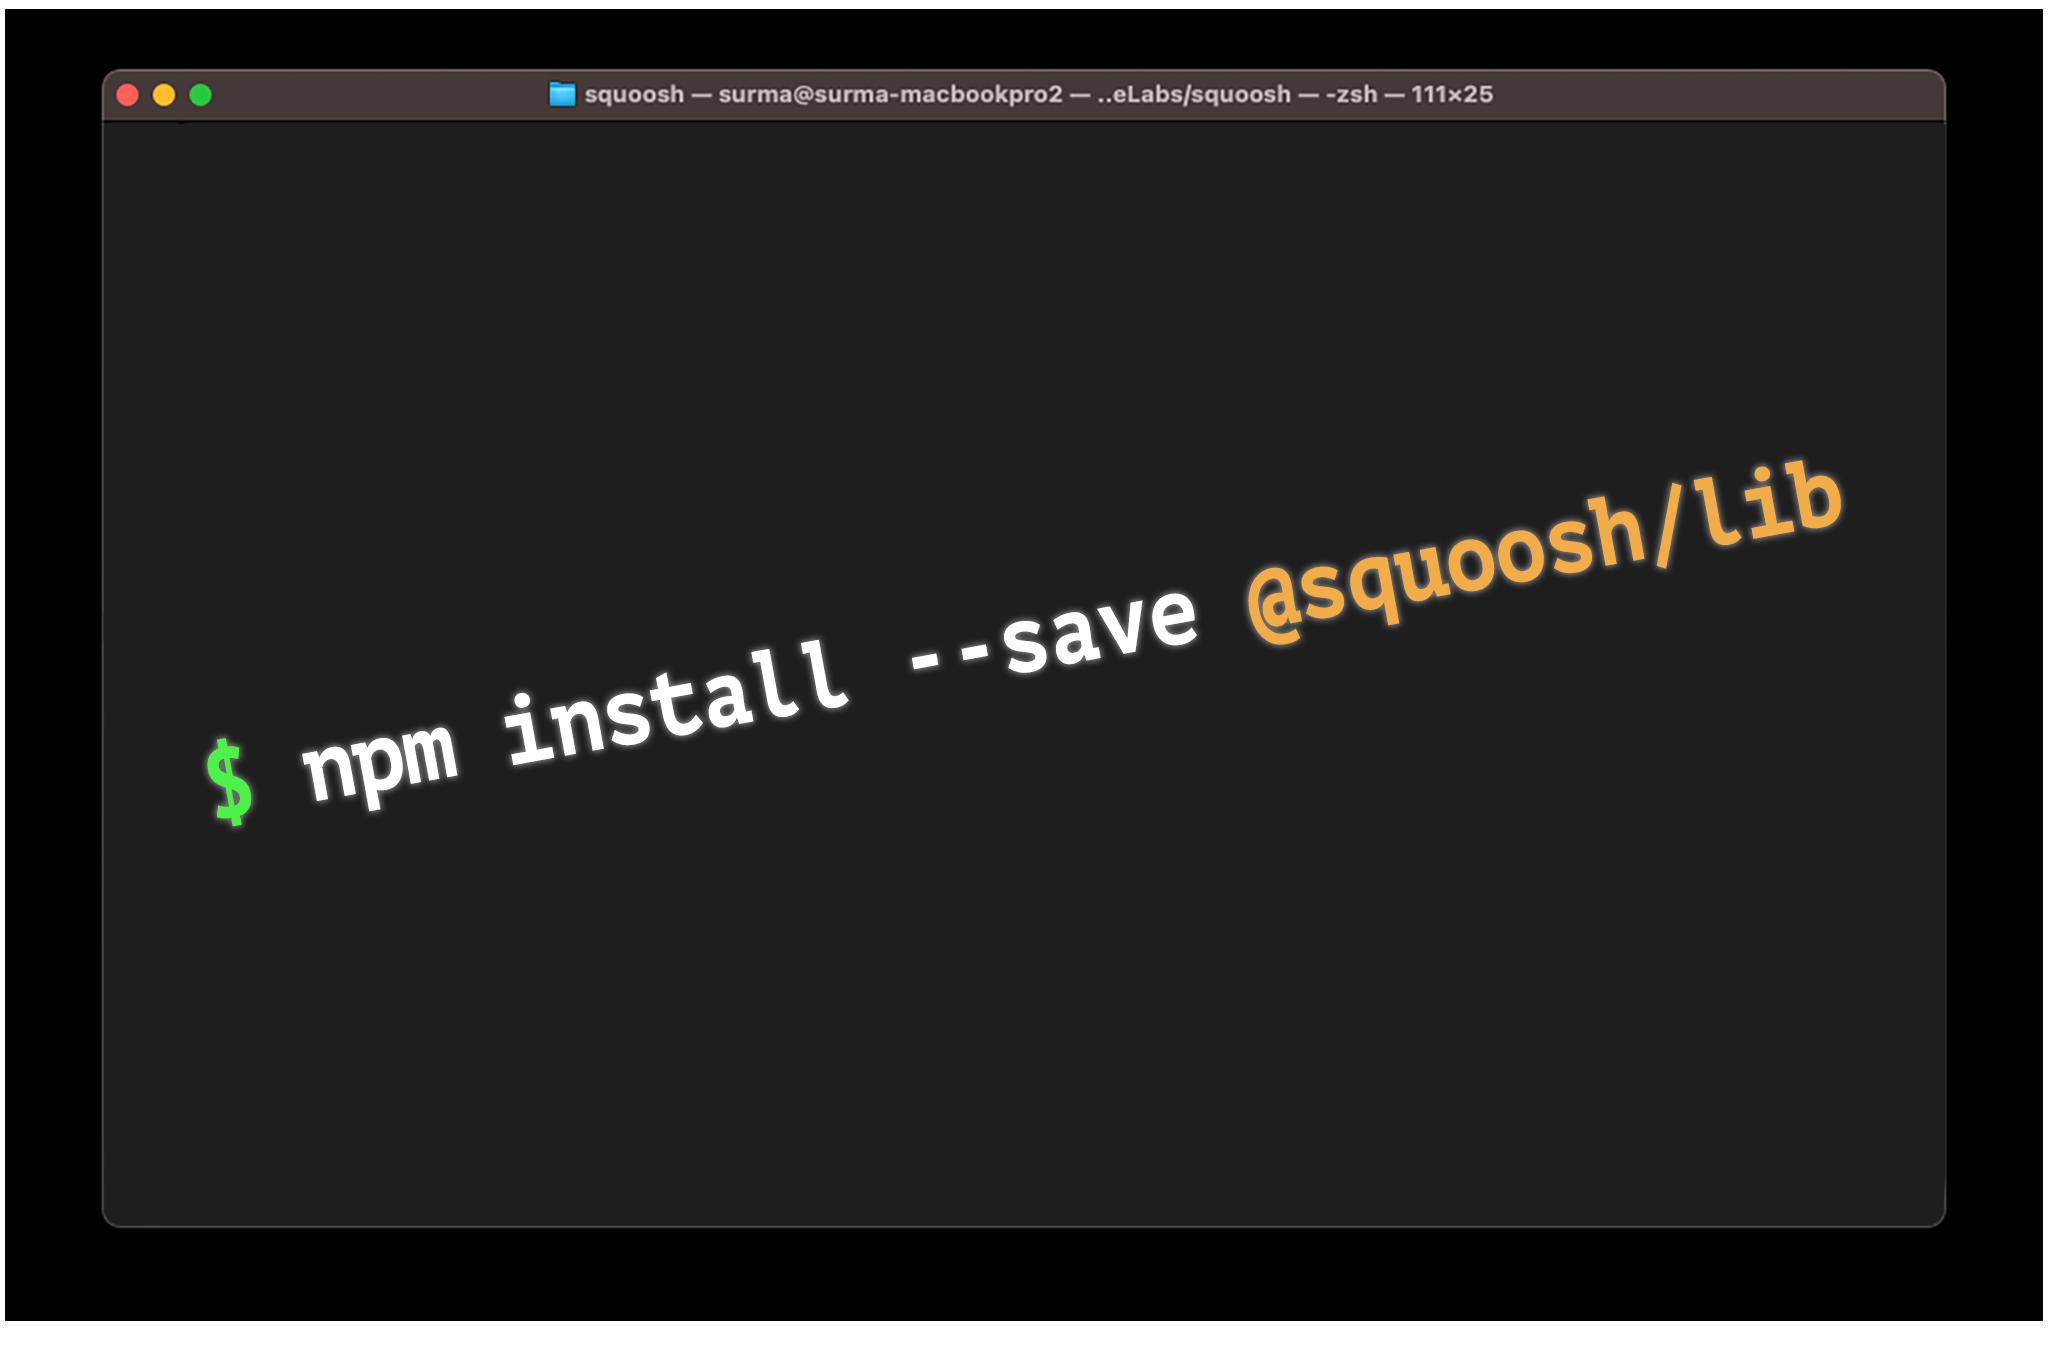 $ npm install --save @squoosh/lib